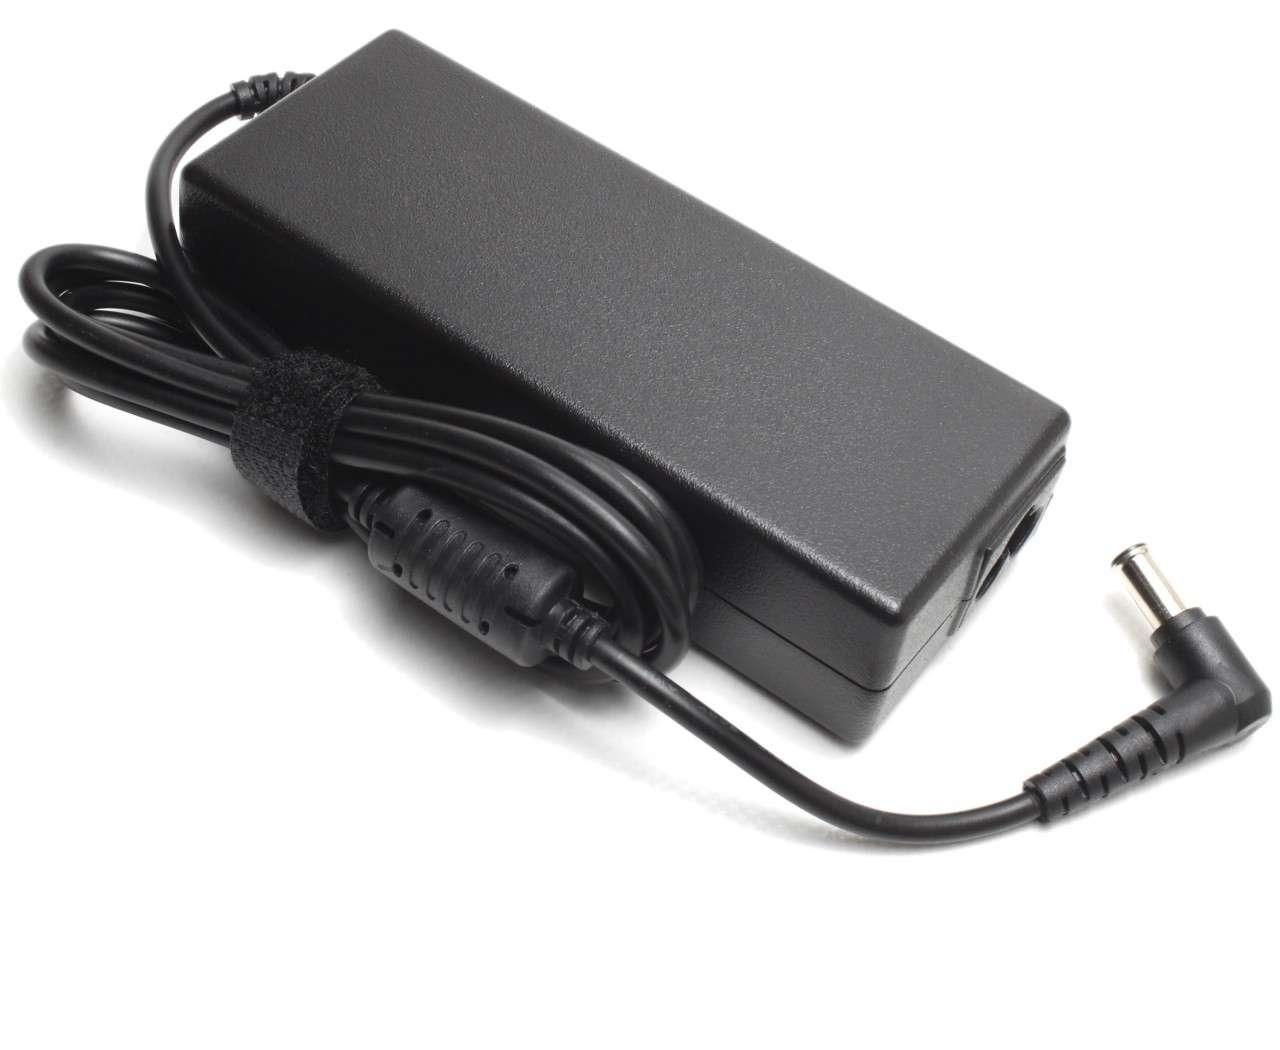 Incarcator Sony Vaio VPCEH2FGX Replacement imagine powerlaptop.ro 2021